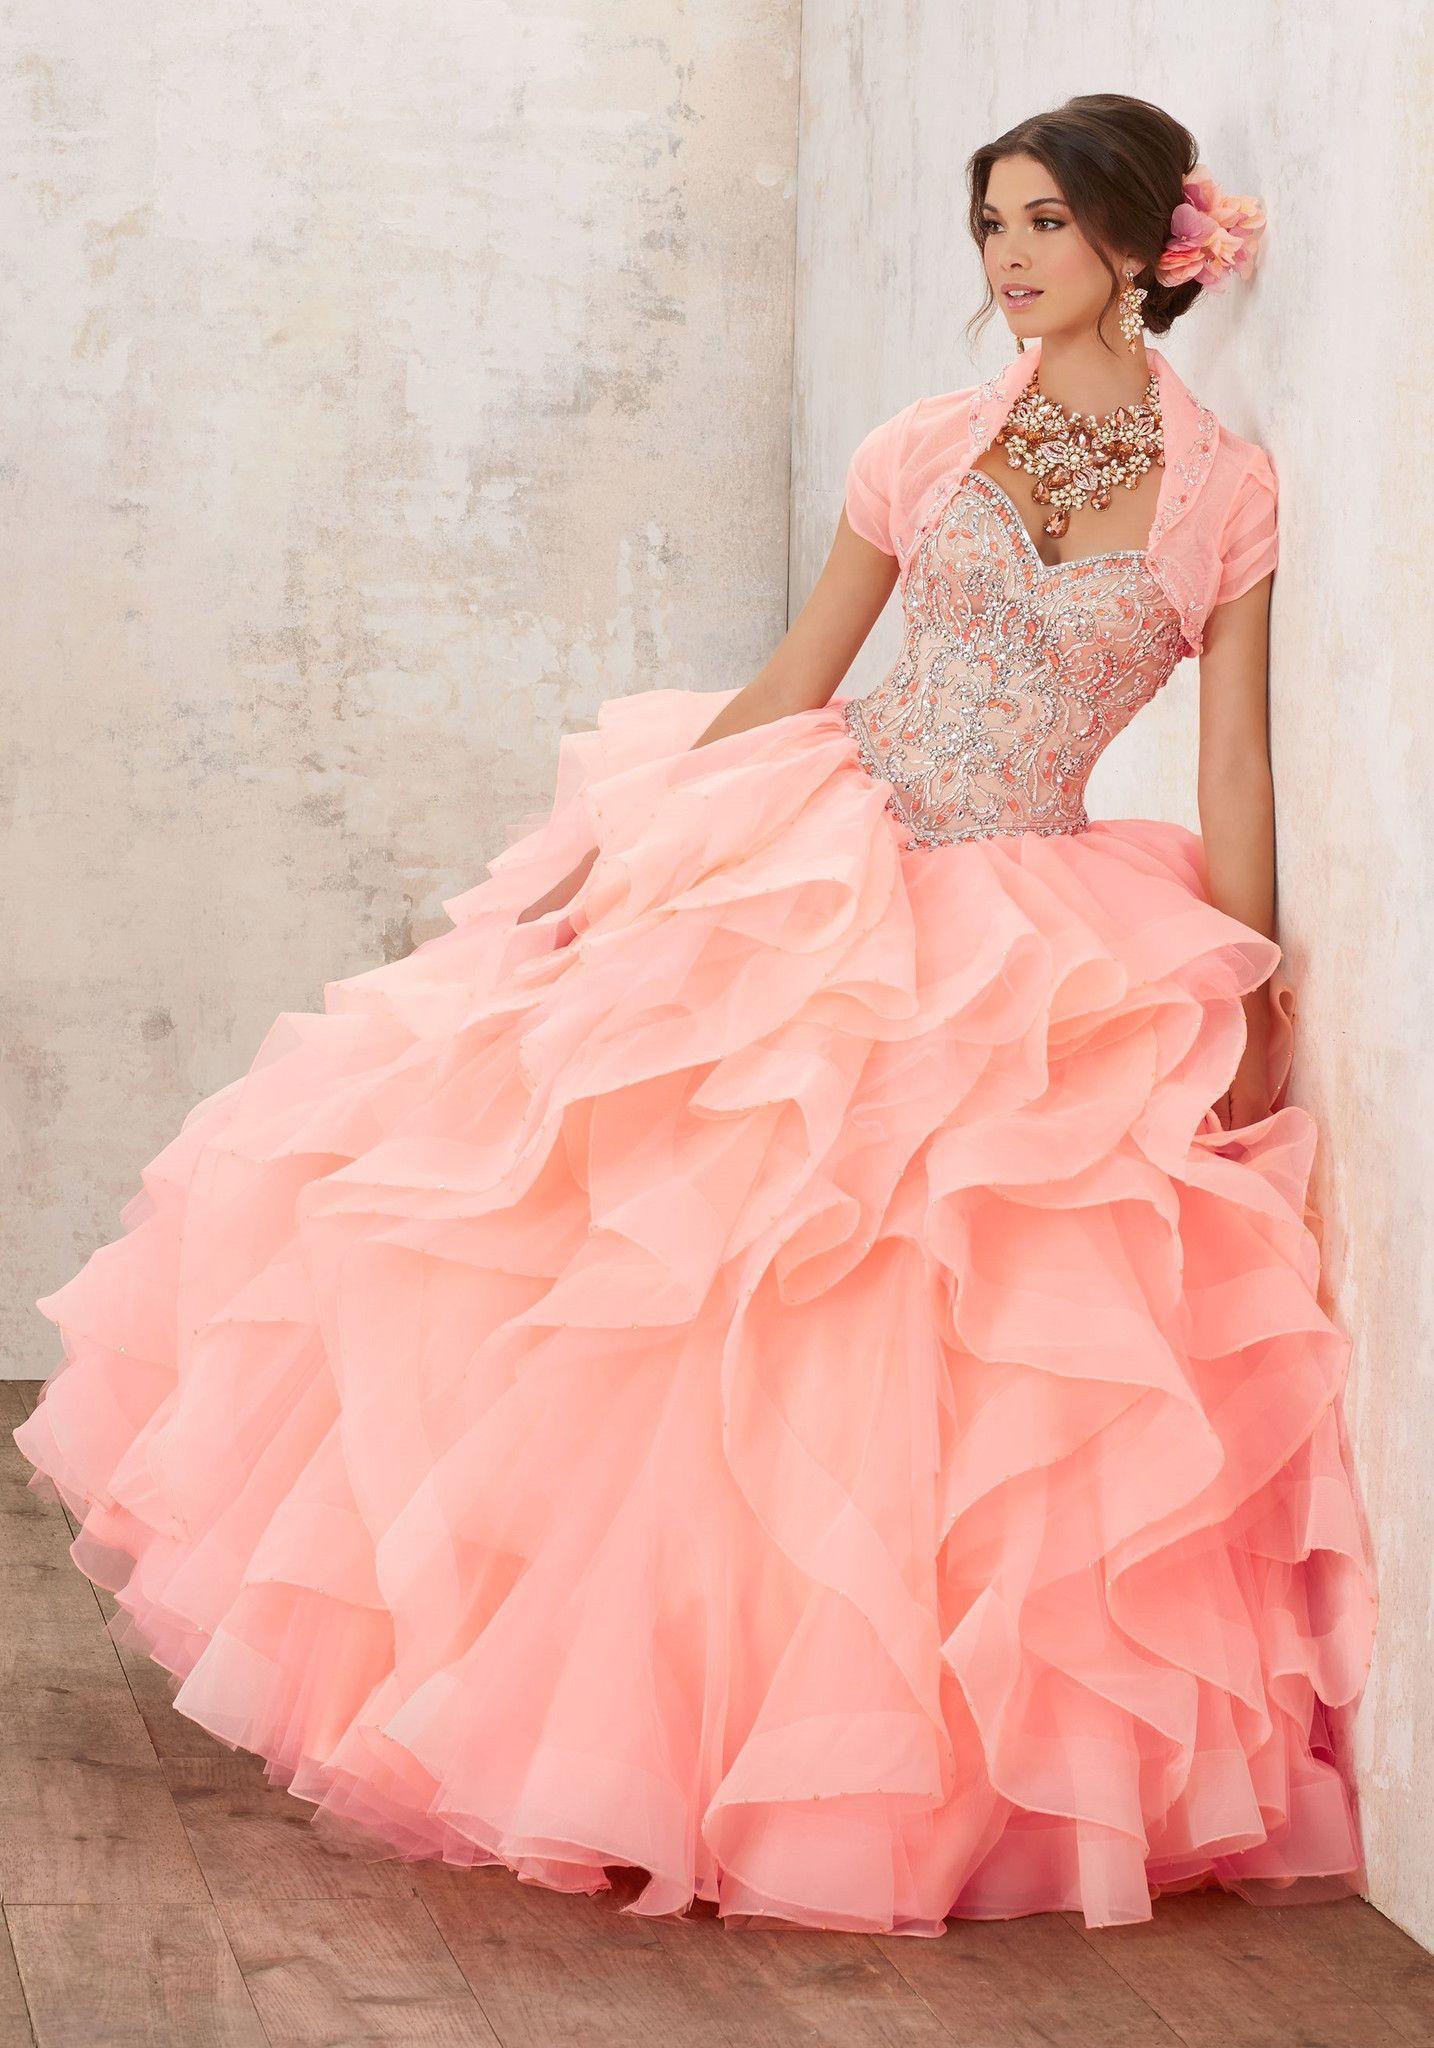 Famoso Vestido De Fiesta Sirena Lee Mori Colección - Colección de ...